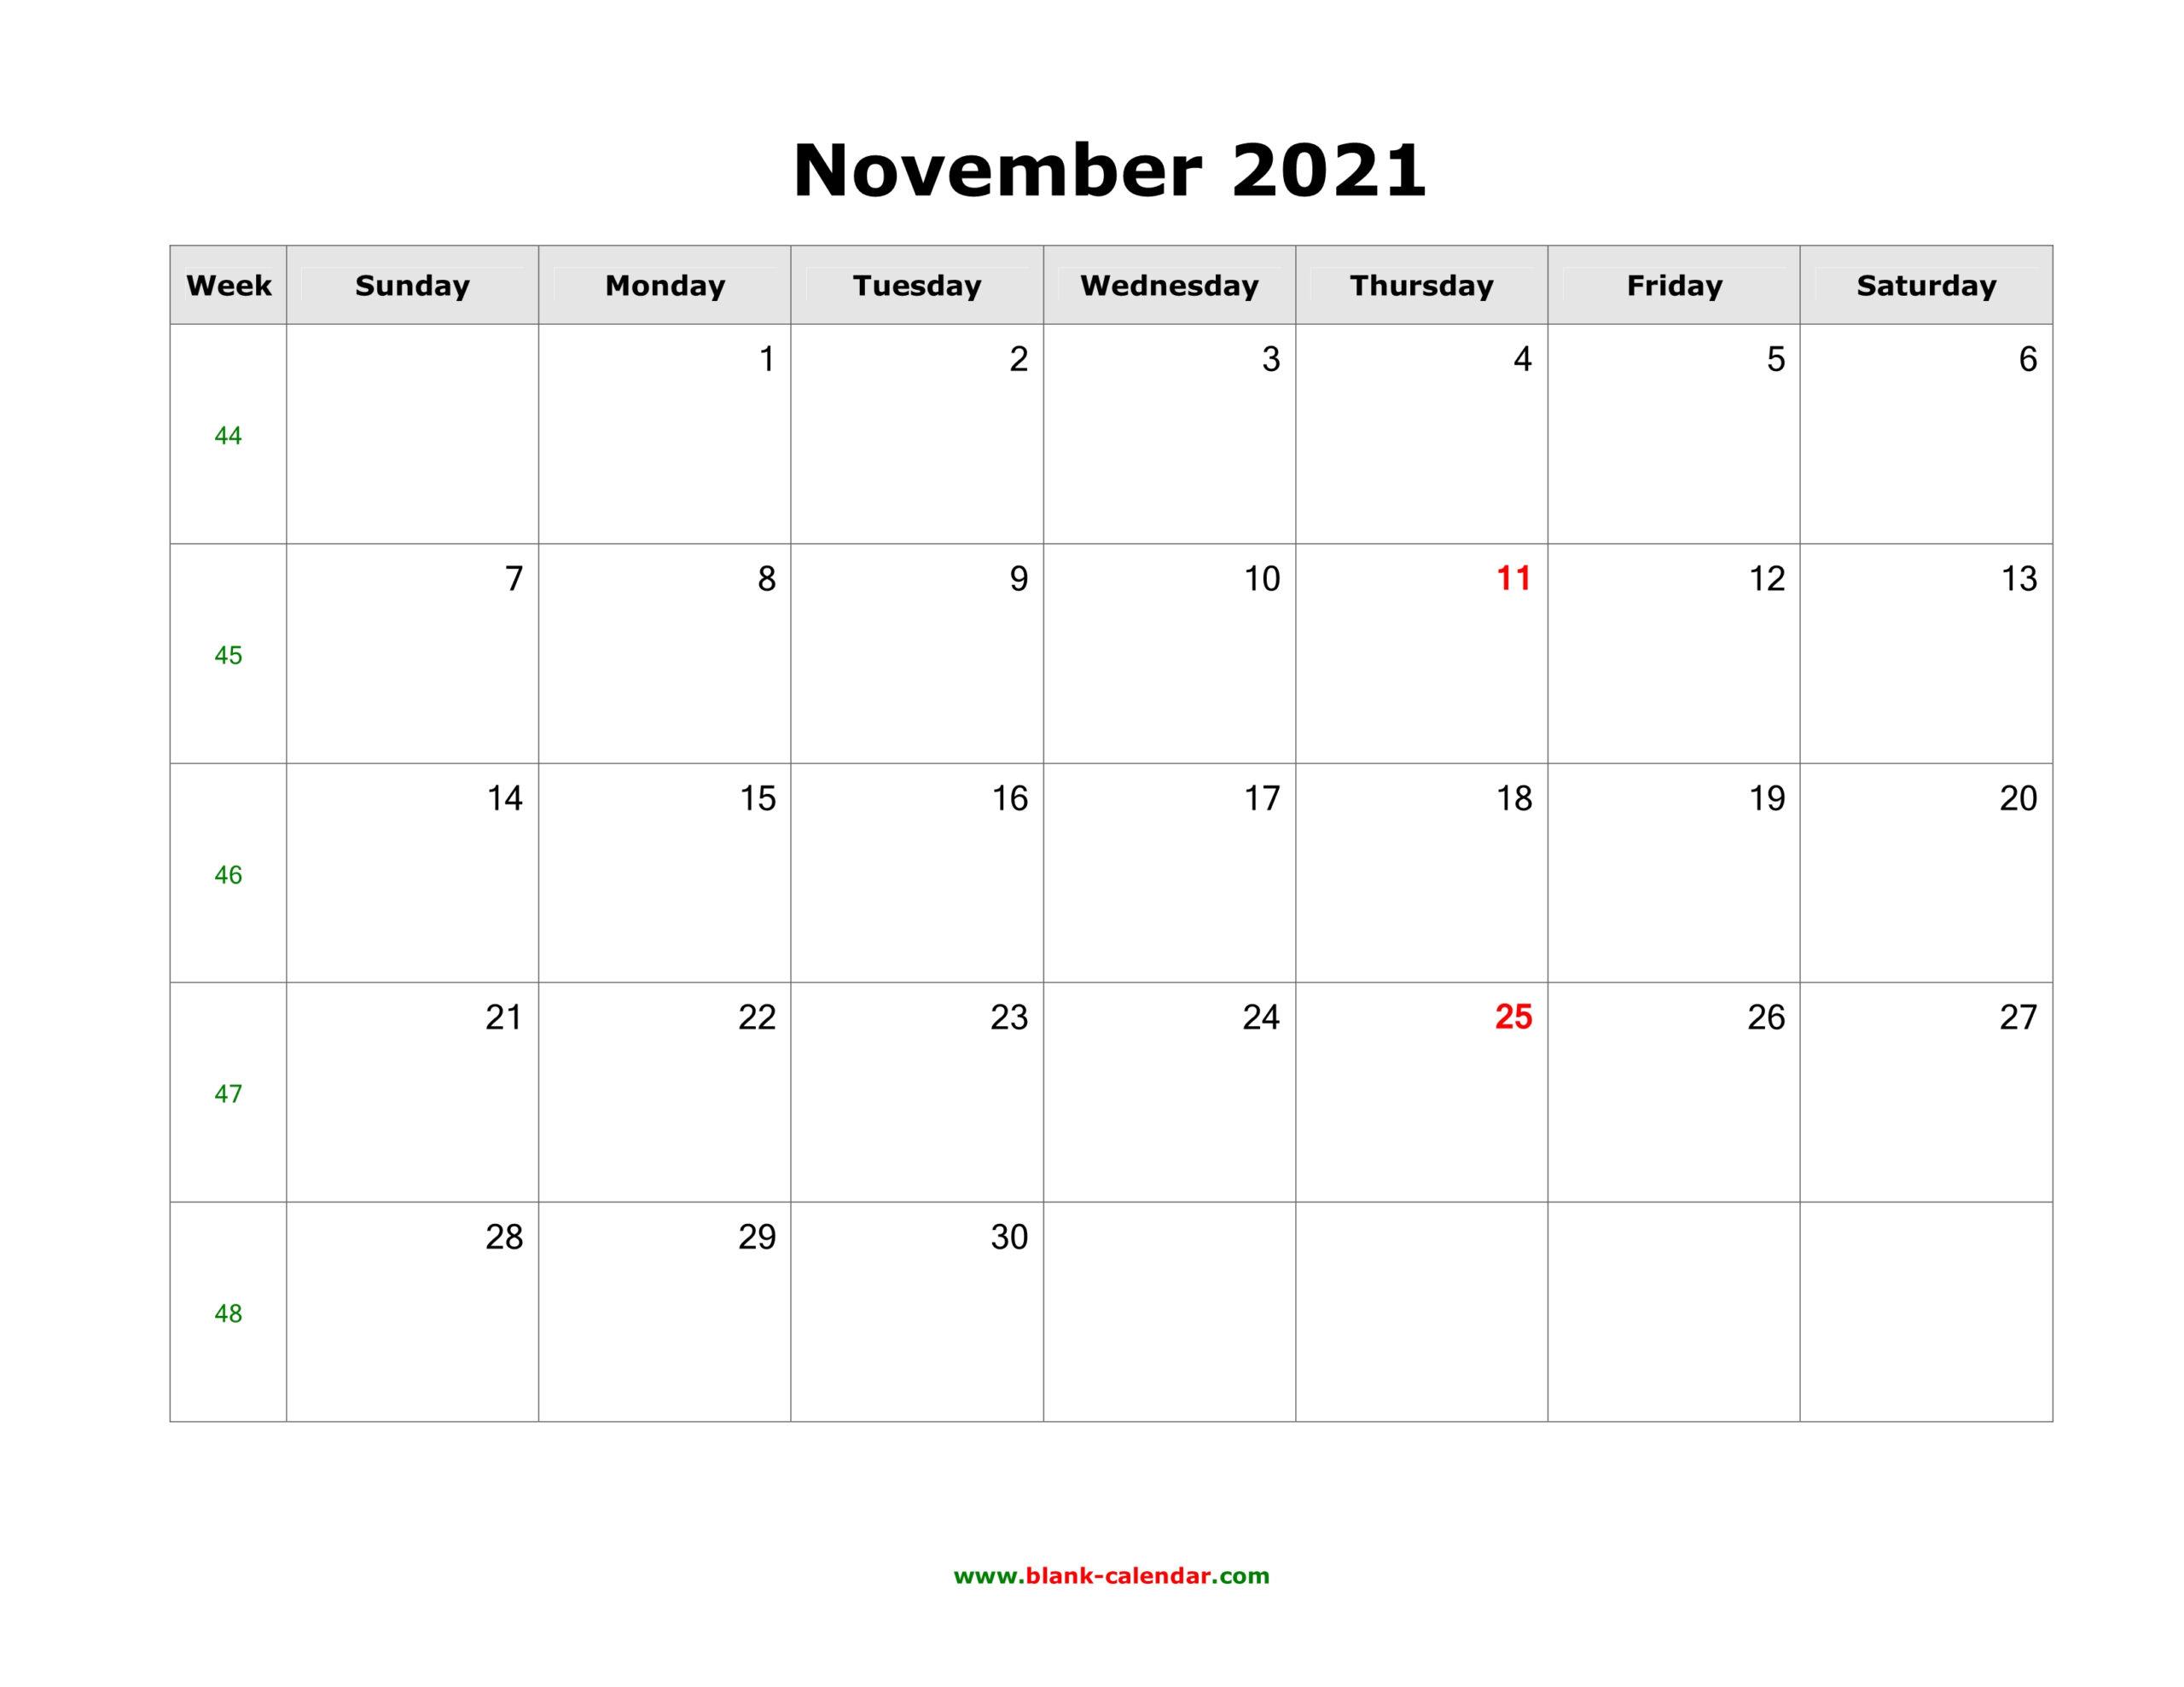 Download November 2021 Blank Calendar (Horizontal)